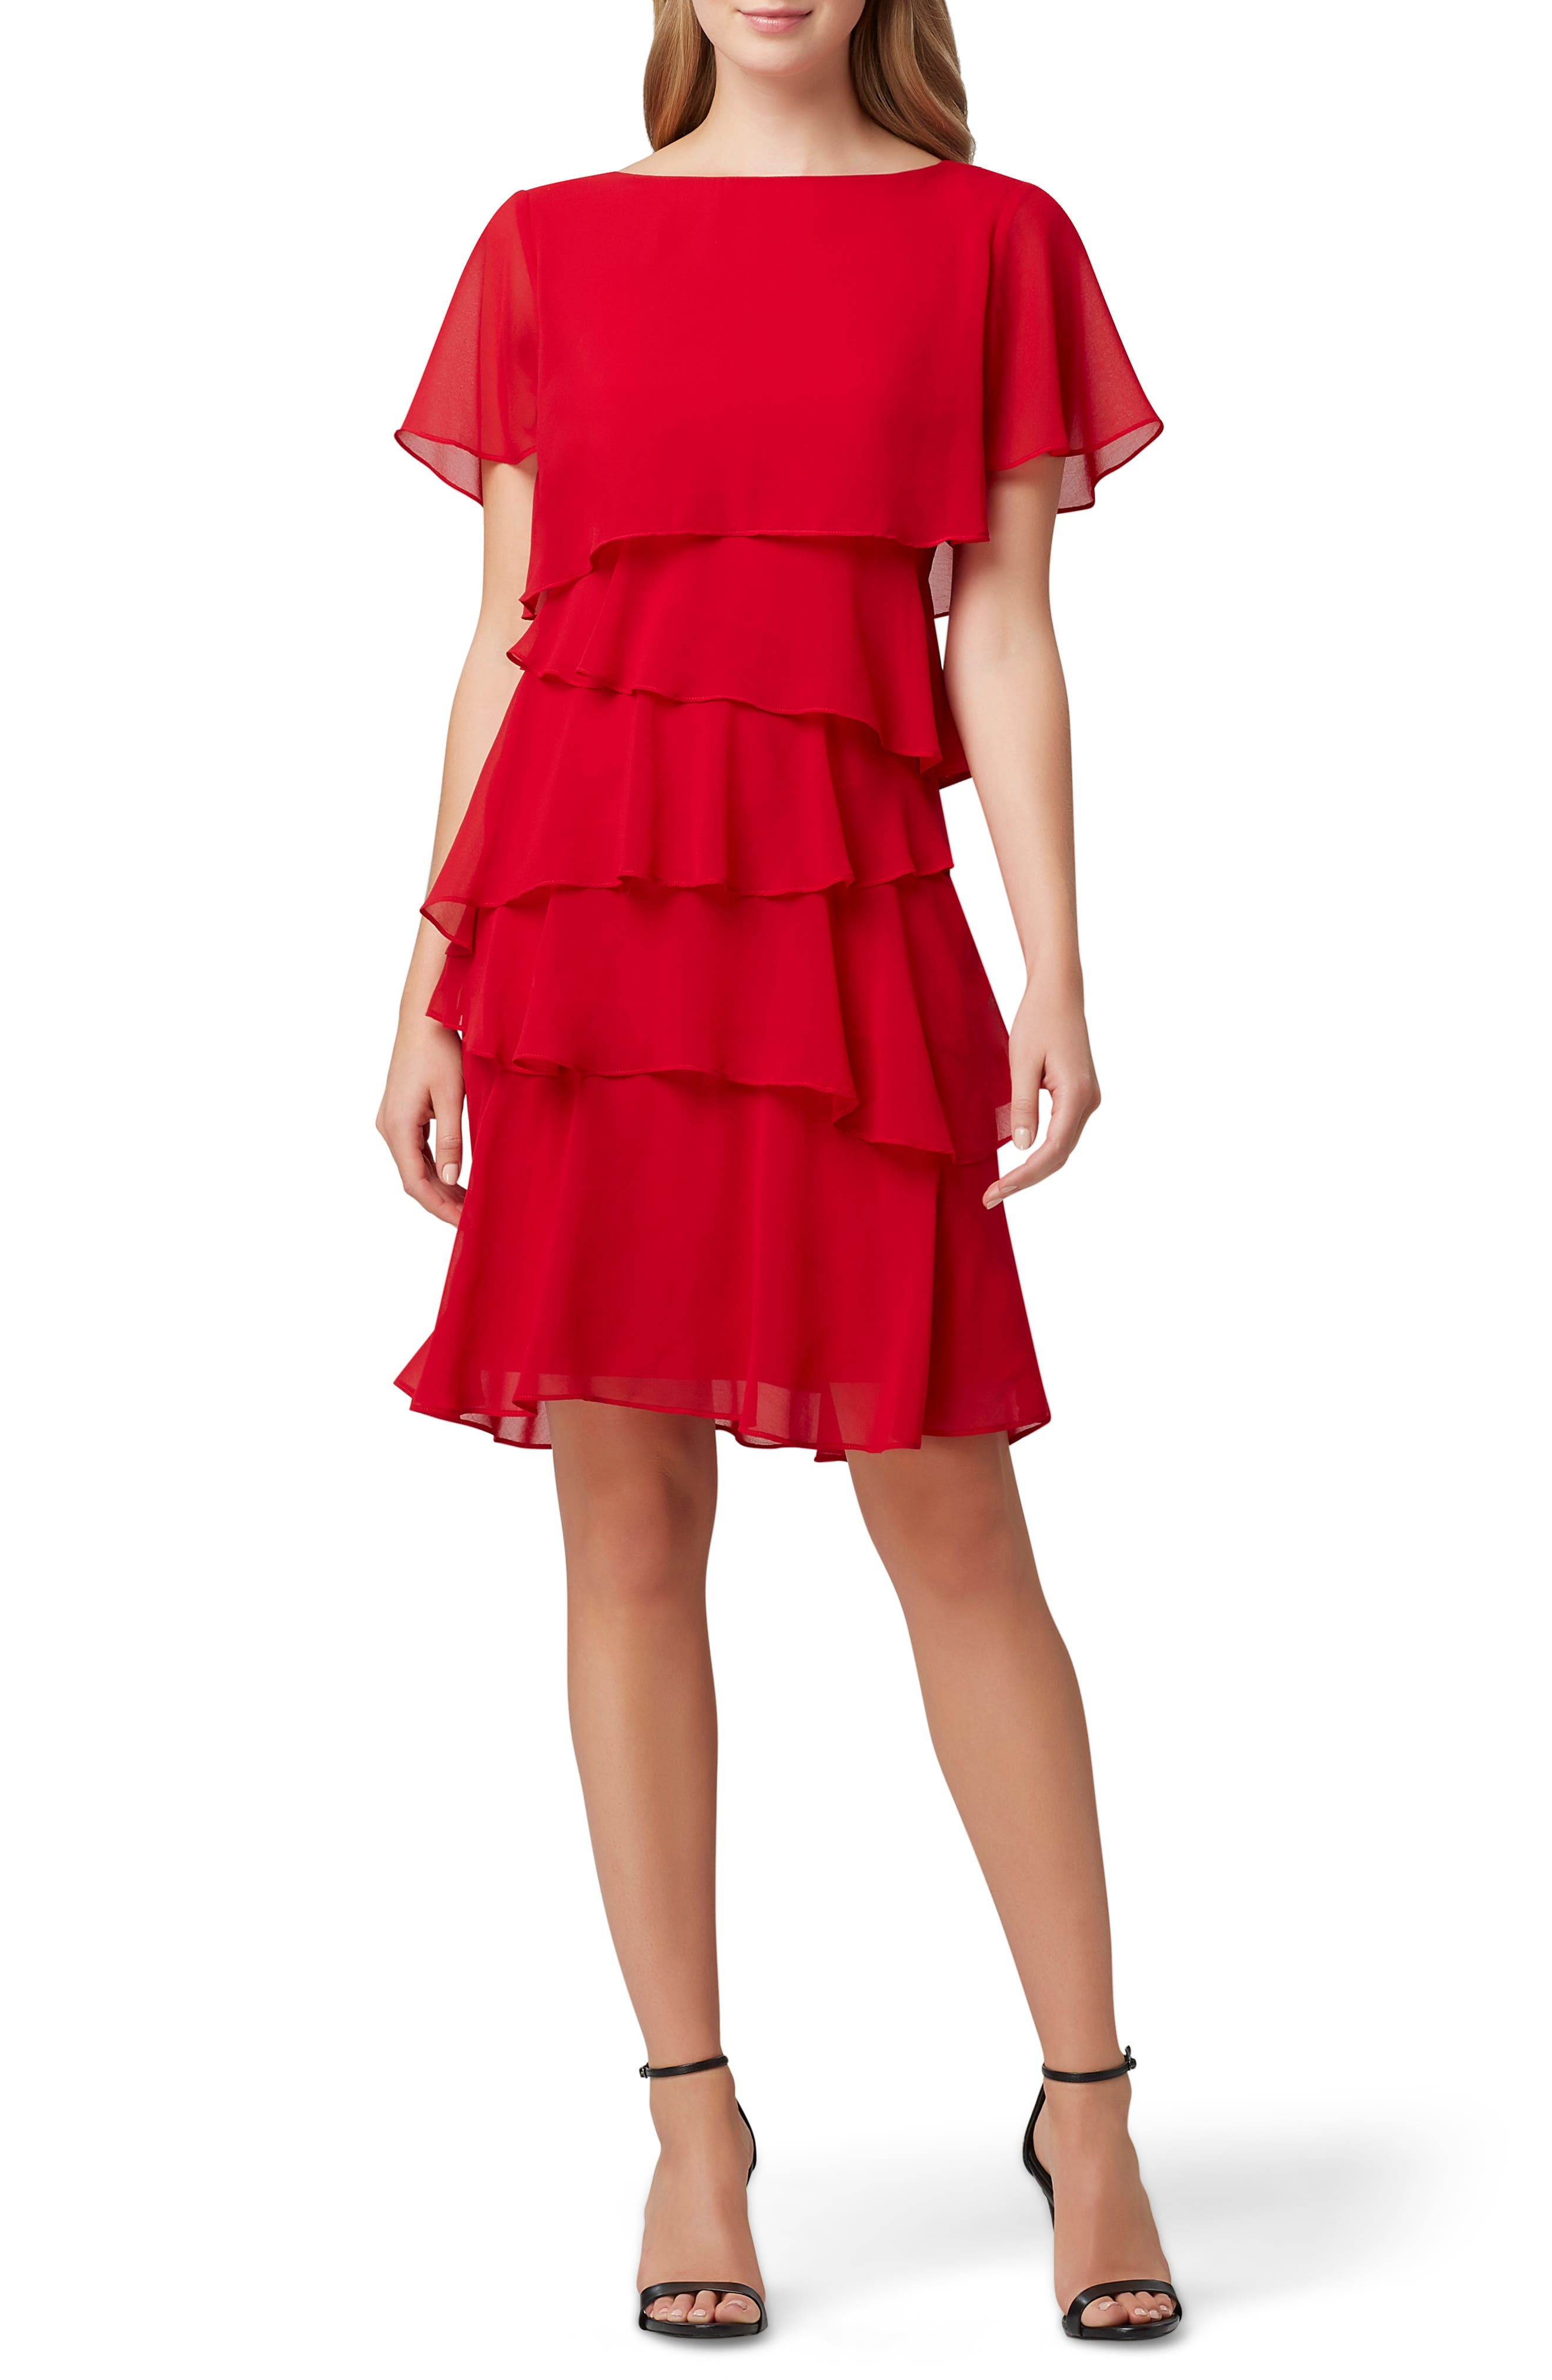 Vintage 1920s Dresses – Where to Buy Womens Tahari Tiered Chiffon Dress $138.00 AT vintagedancer.com